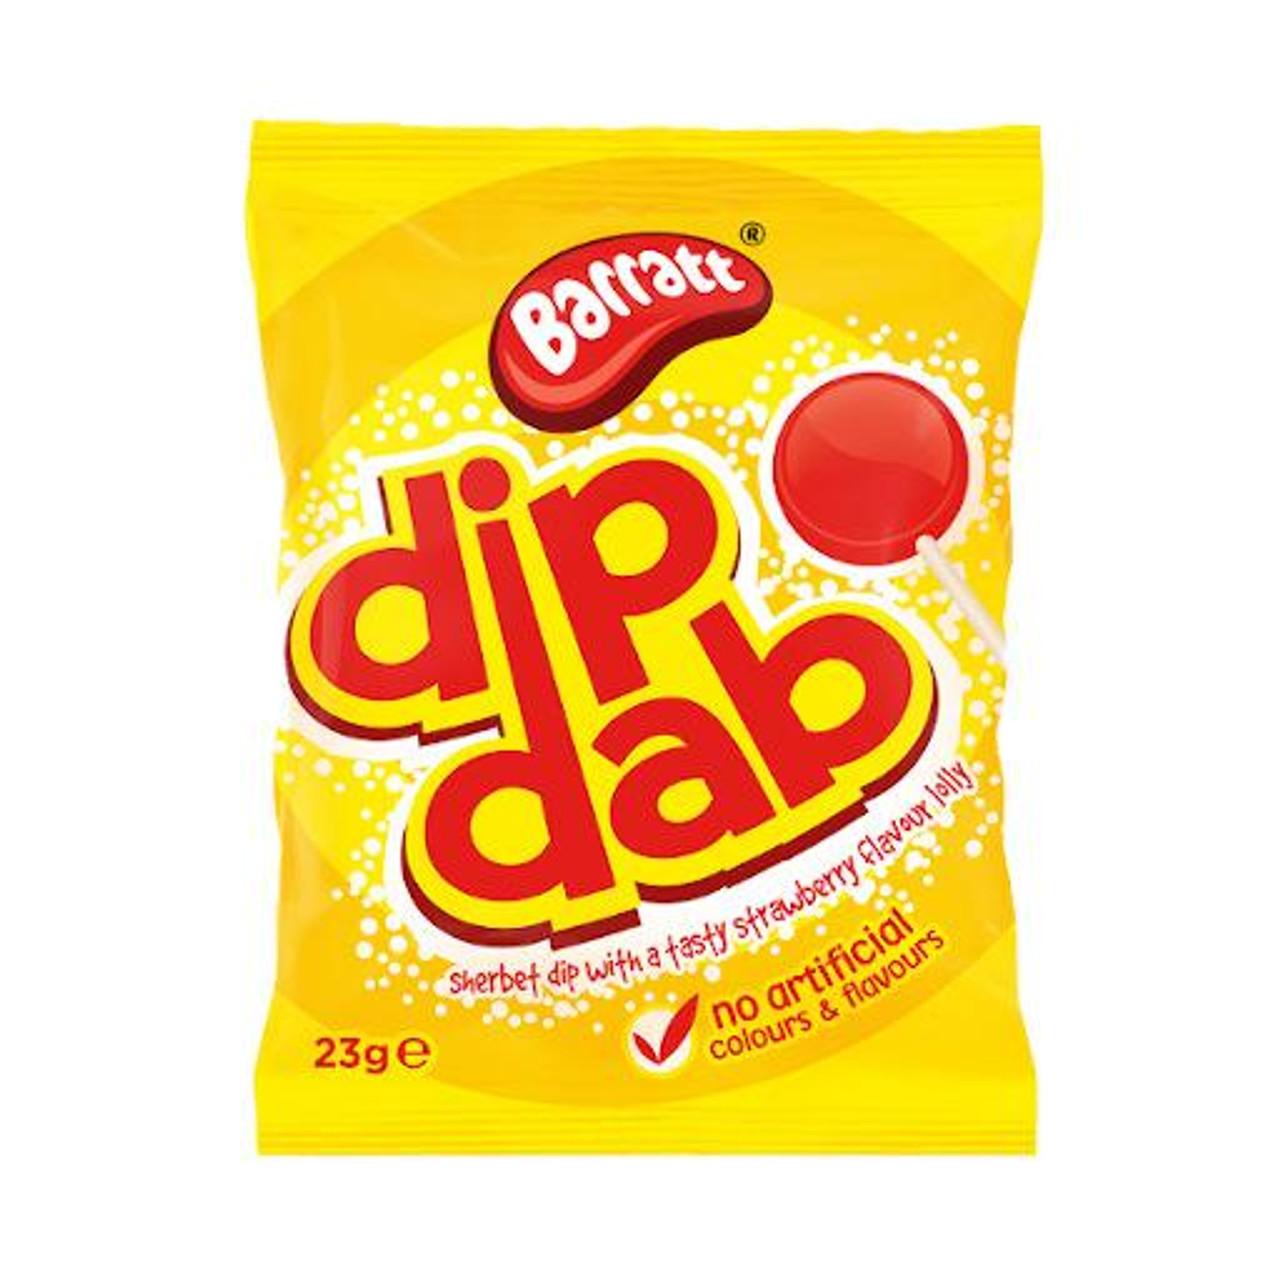 Barratt- Dip Dab, 23g